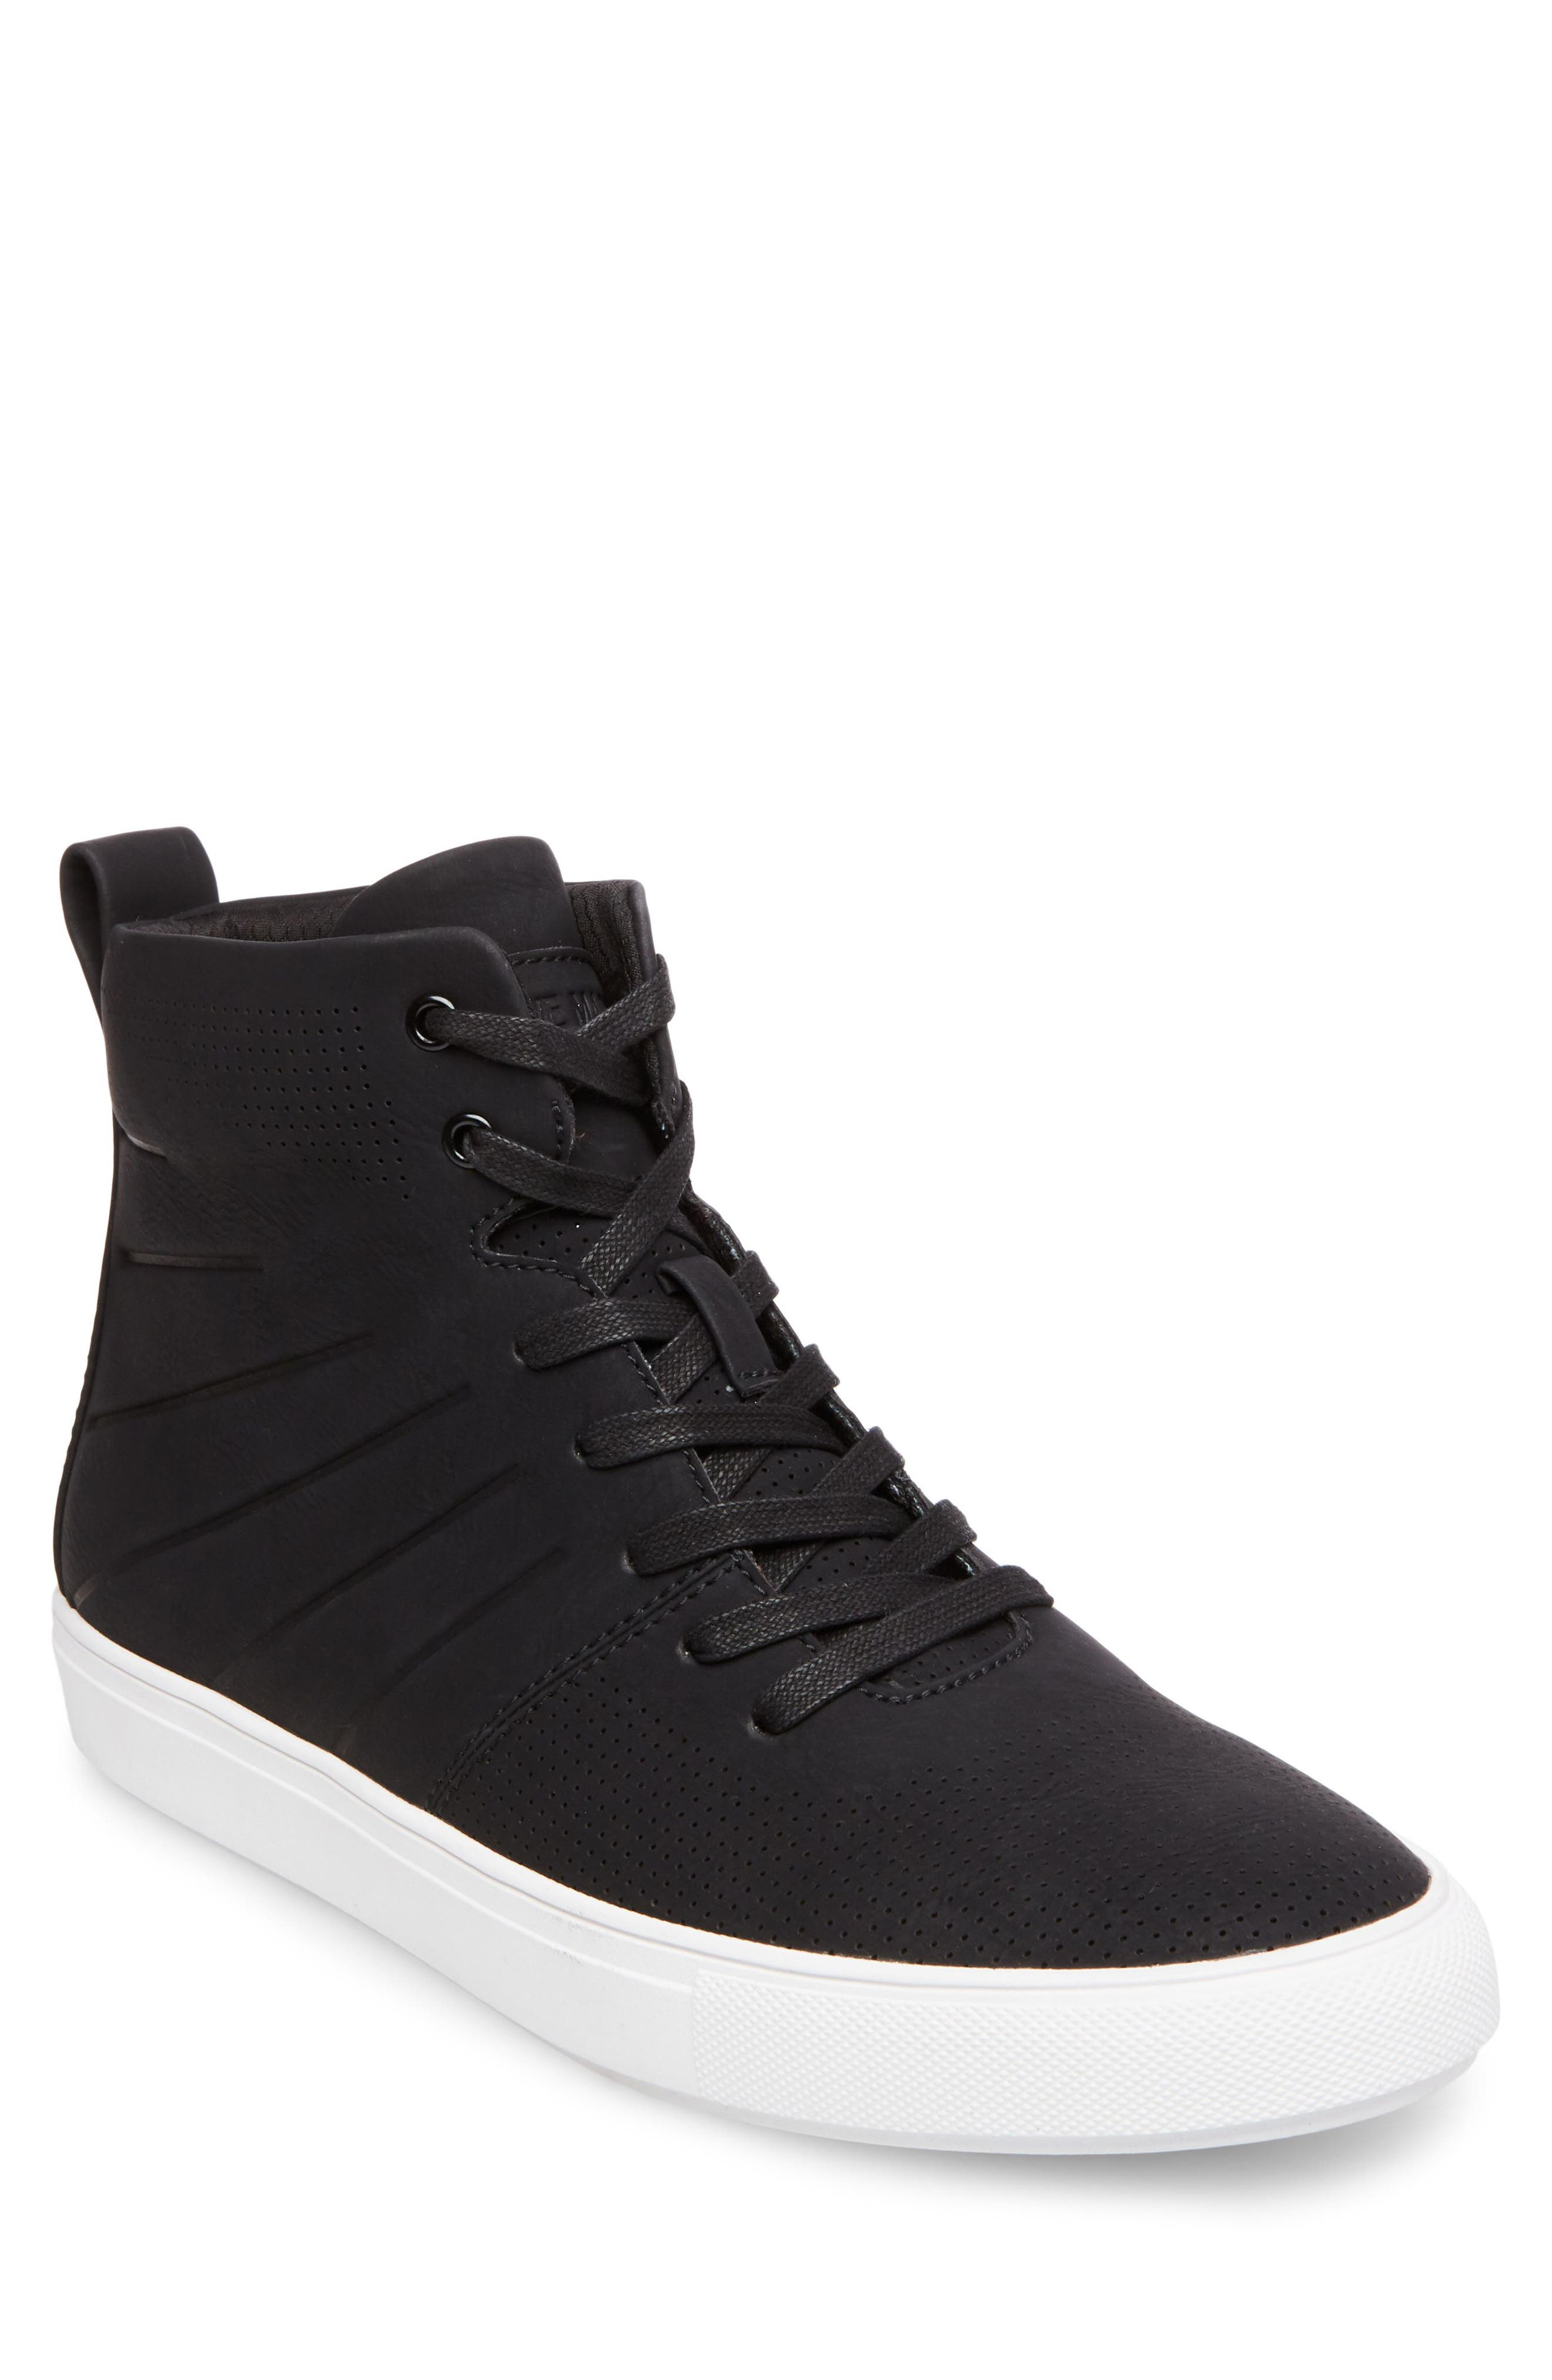 Eskape Sneaker,                         Main,                         color, BLACK